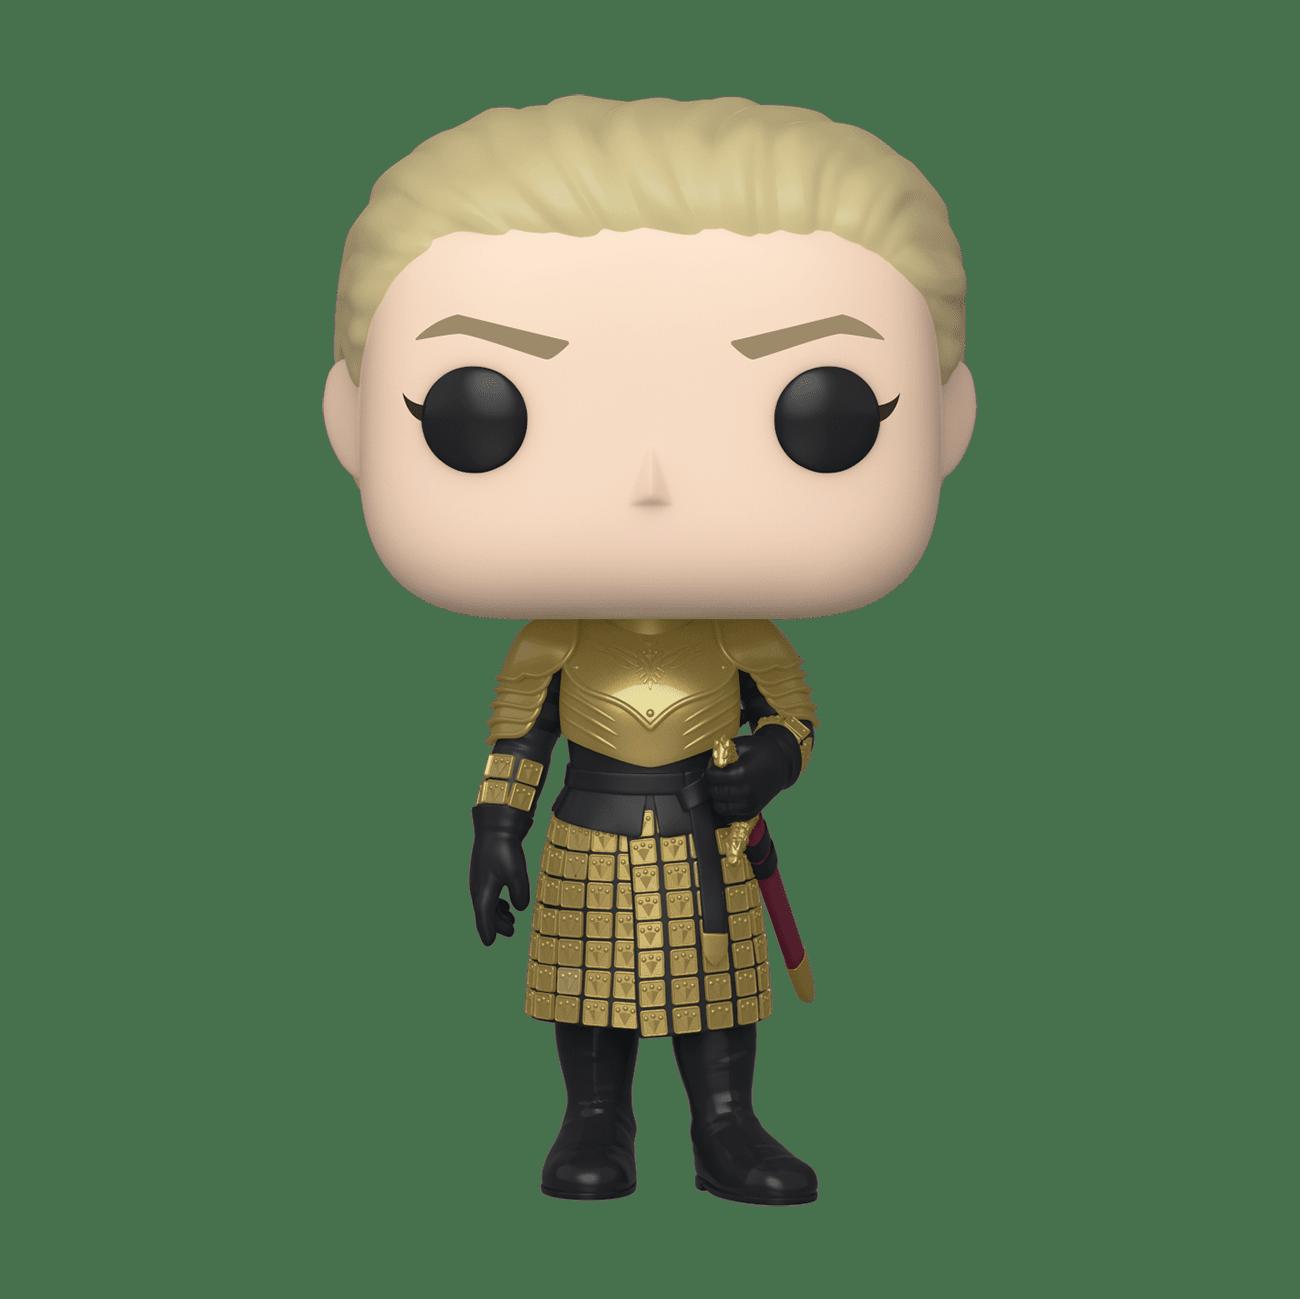 Funko Game of Thrones - Ser Brienne of Tarth Exclusive Pop! Vinyl Figure